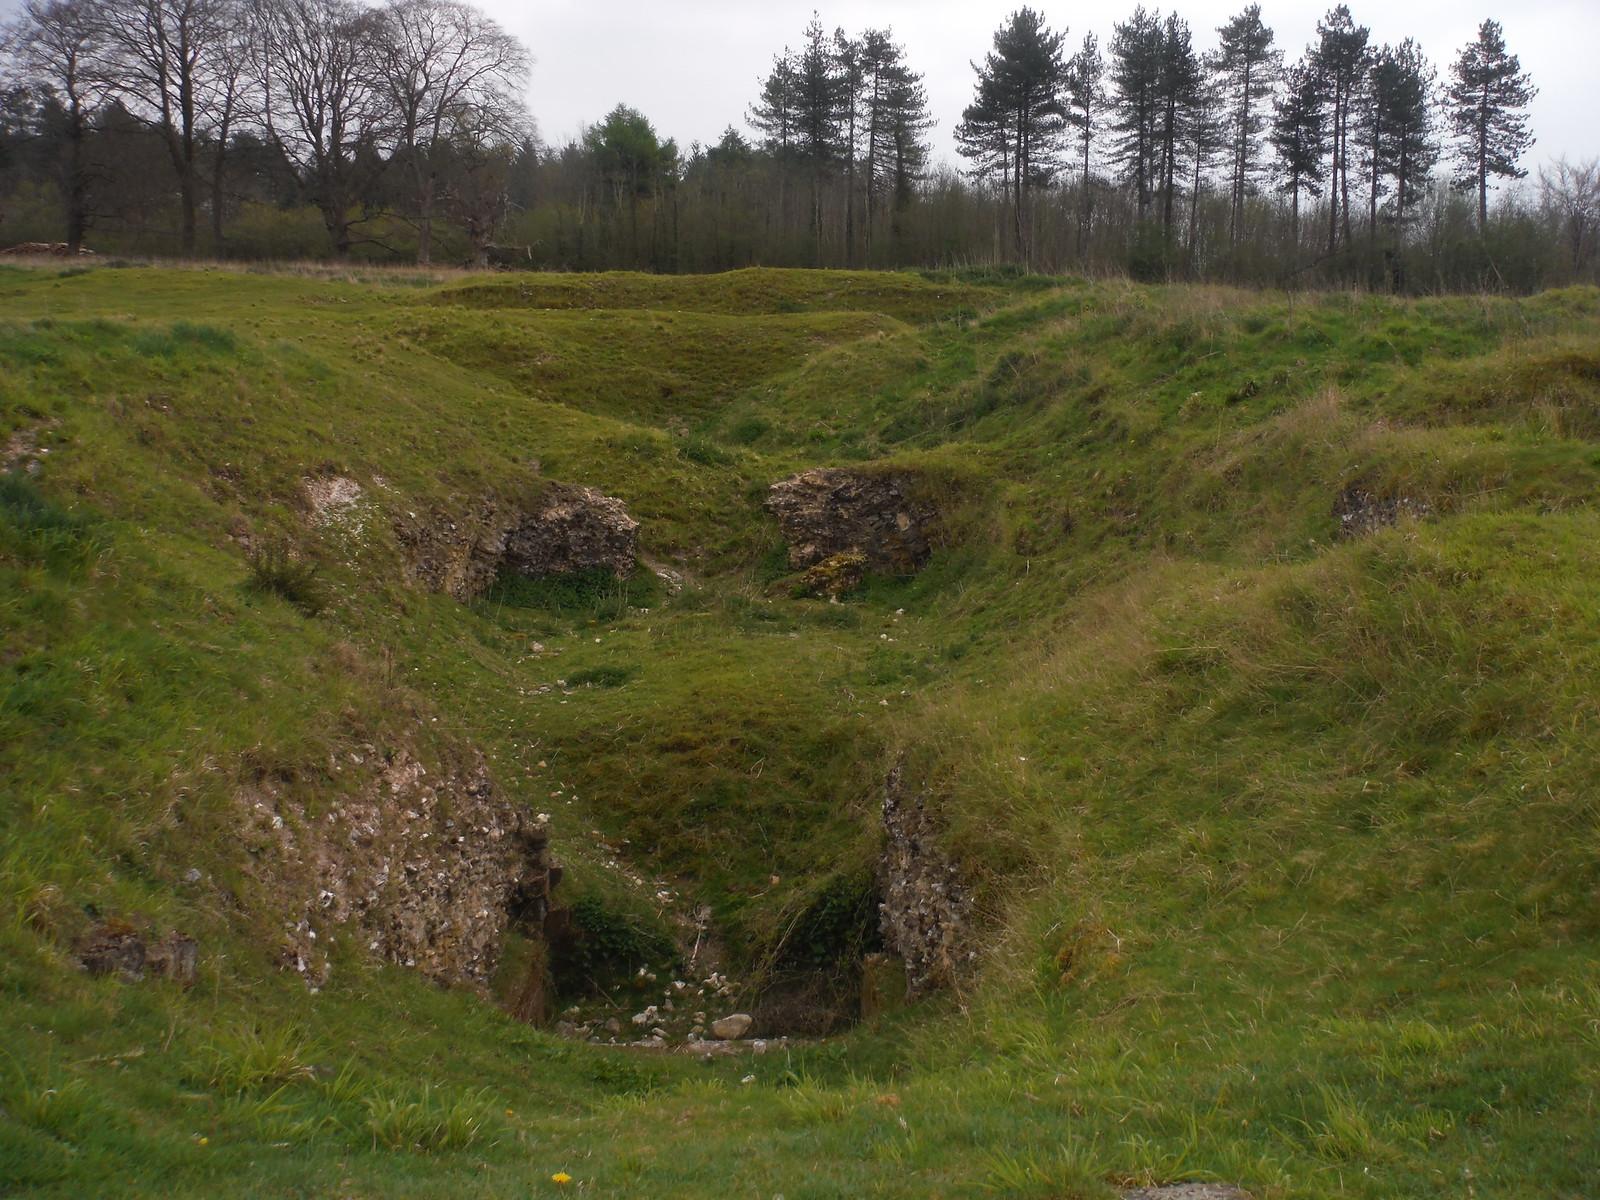 Wine Cellar remnants, Clarendon Palace SWC Walk 265 - Dean to Mottisfont and Dunbridge (Alternative Start from Salisbury)